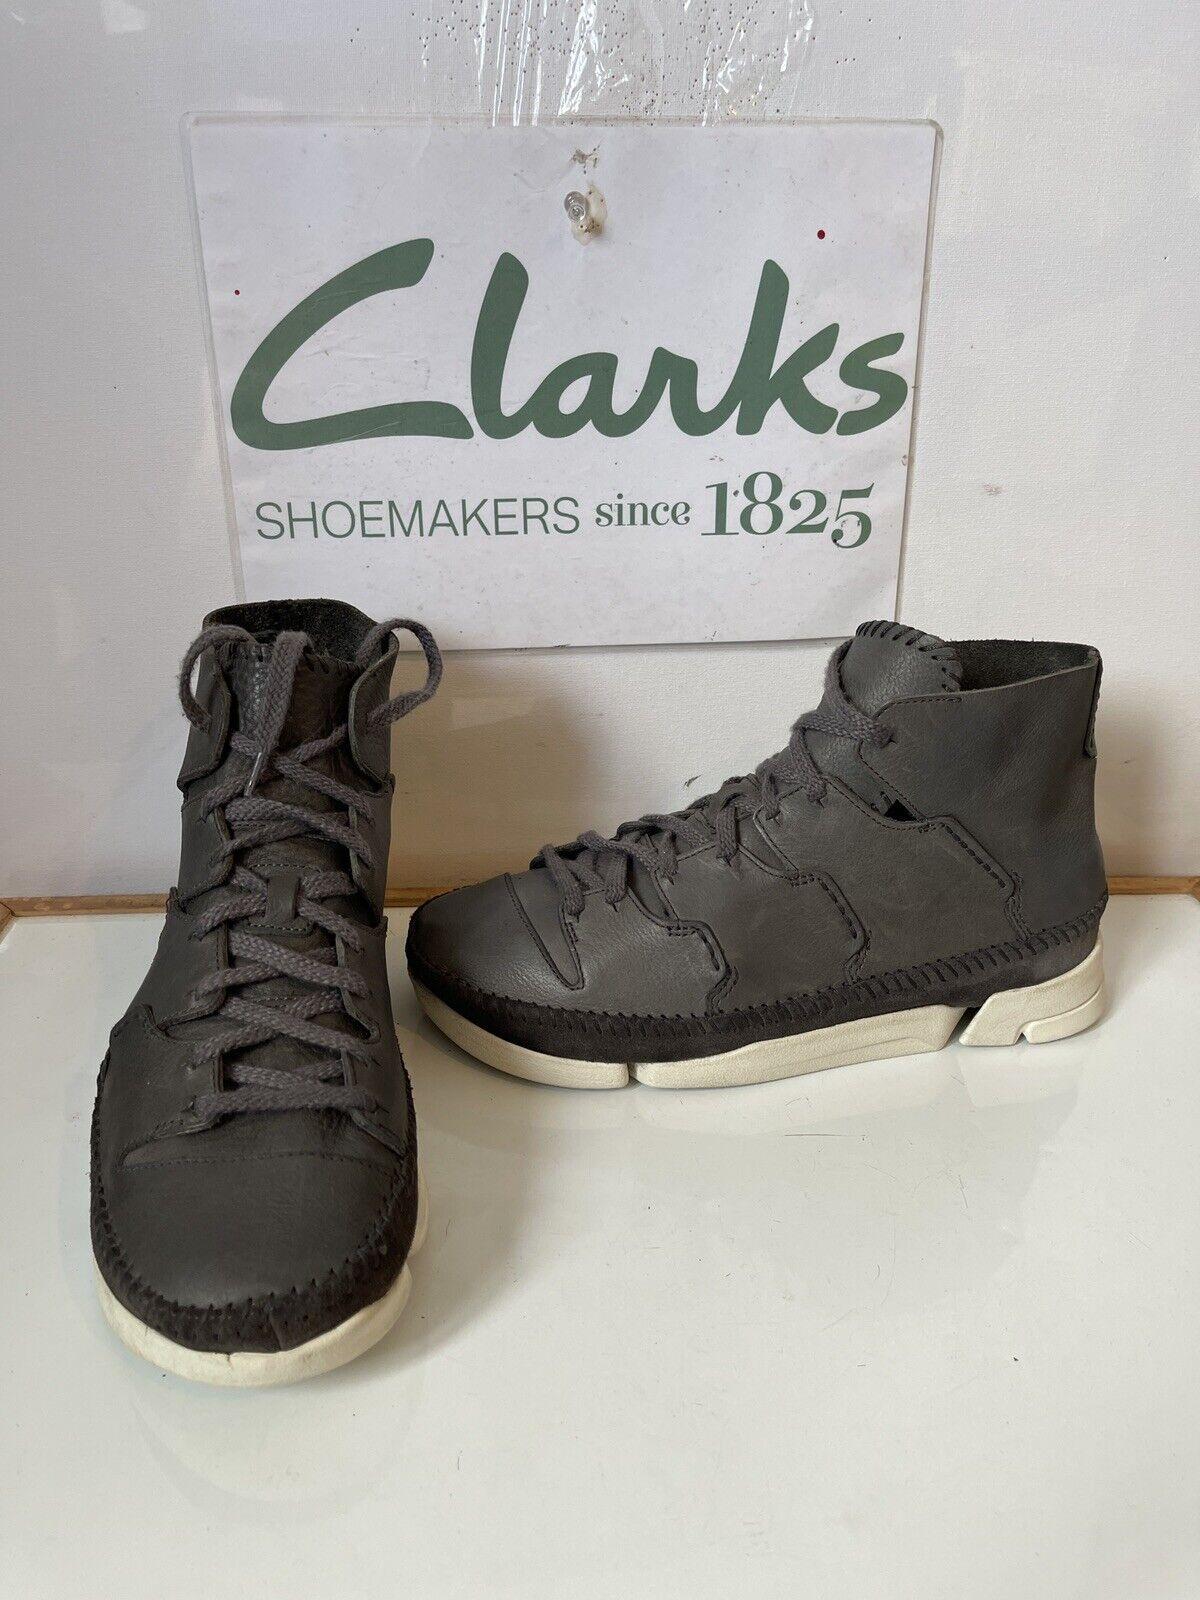 Clarks Original Trigenic Flow Vibram Leather Boots Size UK 8.5 EU 42.5